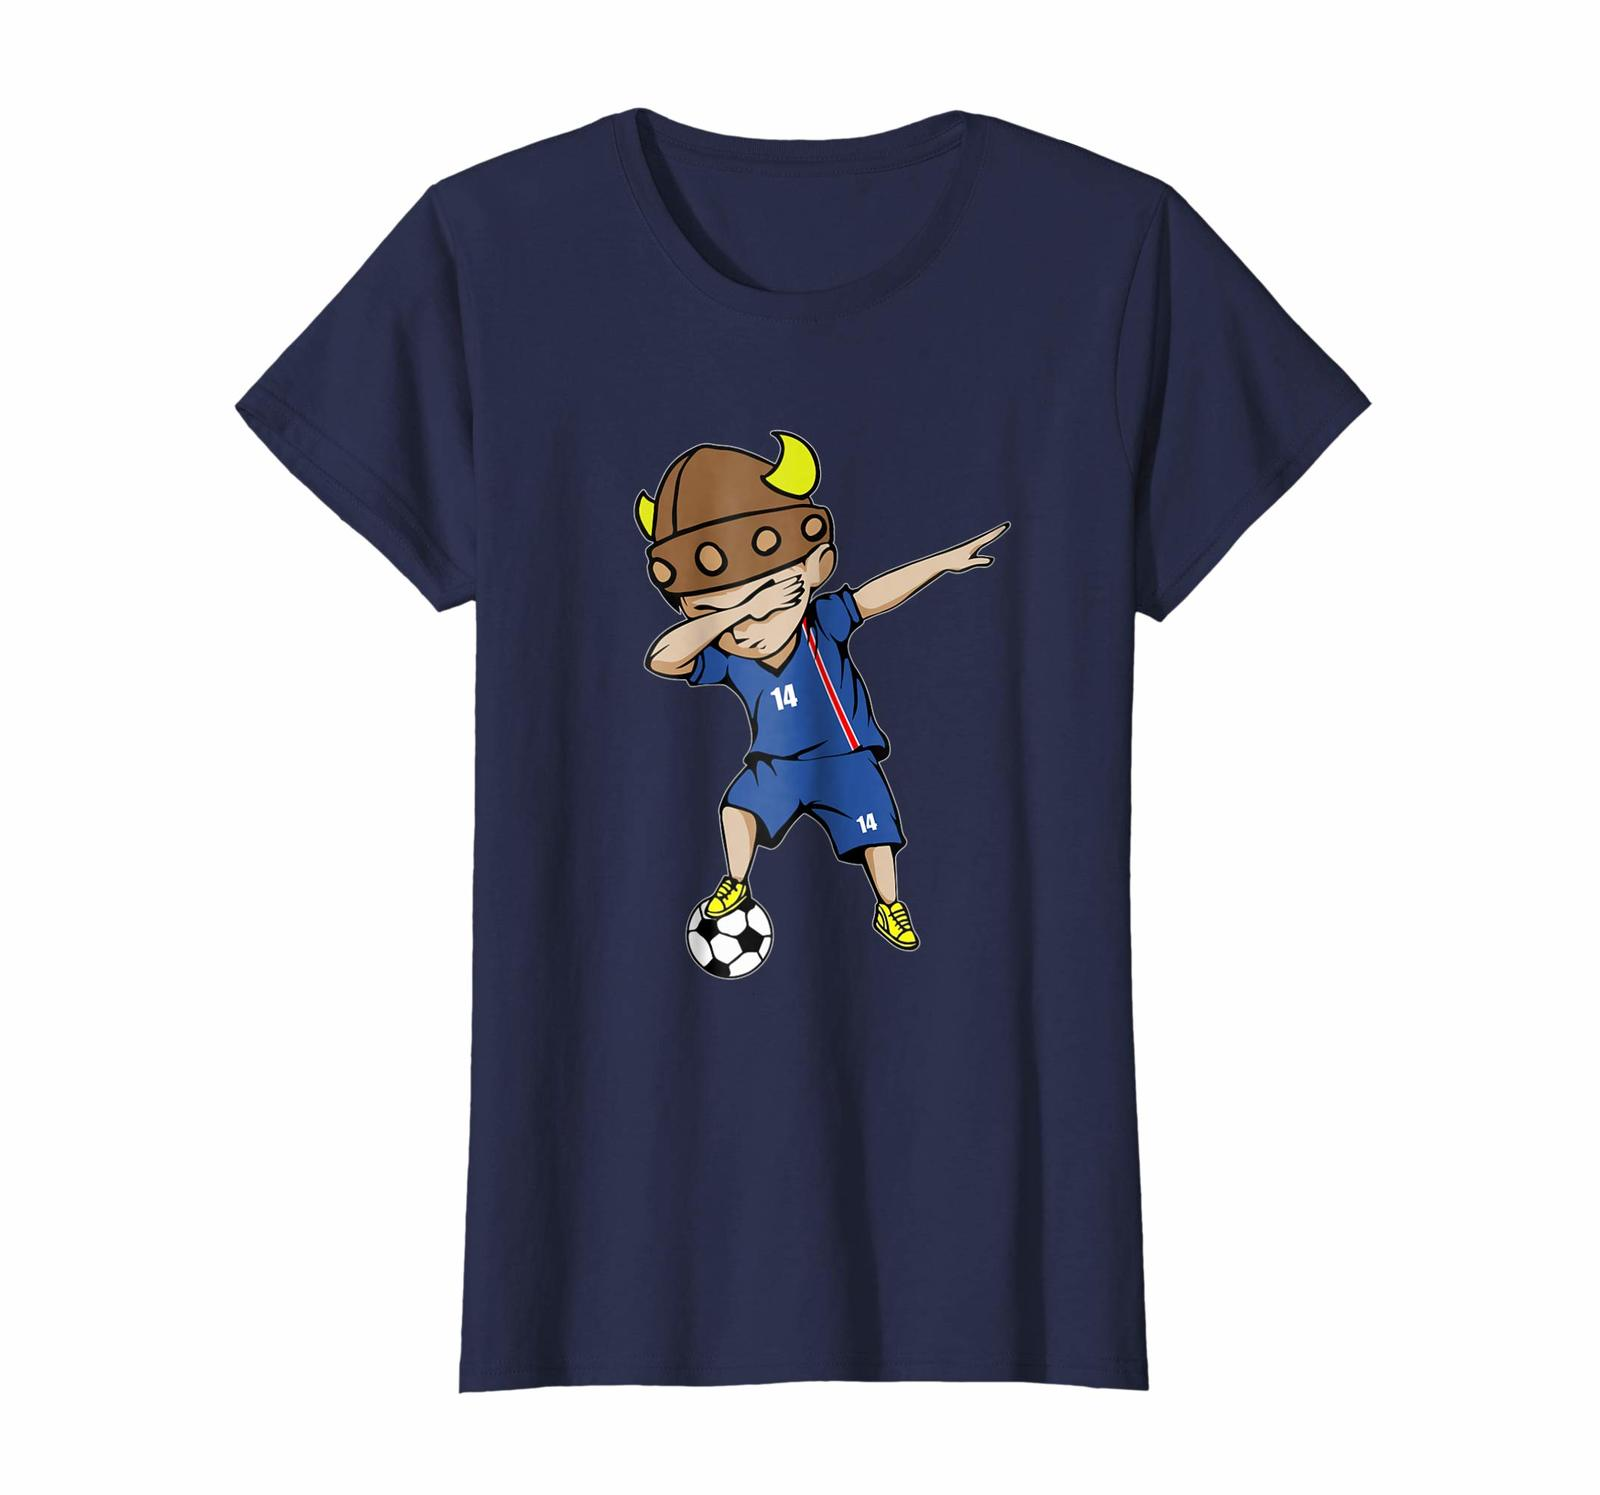 Sport Shirts - Dabbing Soccer Boy Iceland Jersey T-Shirt - Number 14 Tees Wowen